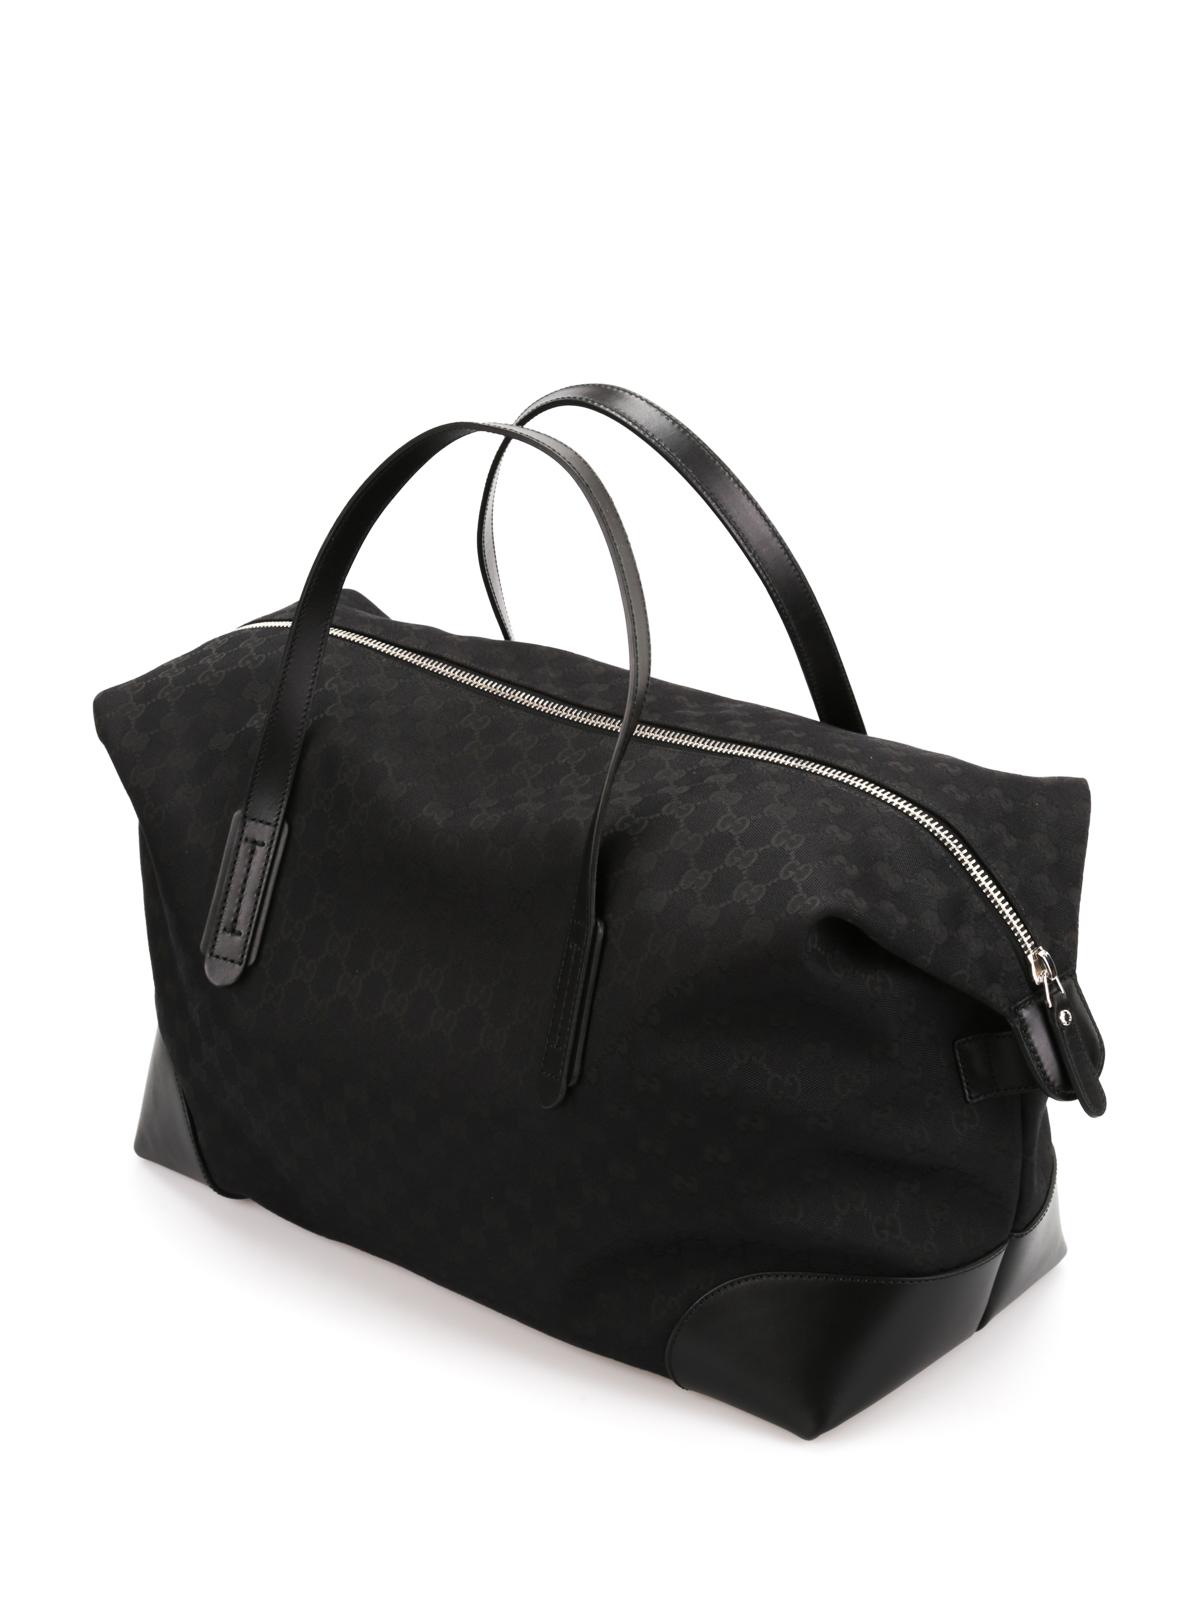 b4b2dca17 Gucci - GG canvas duffle bag - Luggage & Travel bags - 308925 F4CSN 1060